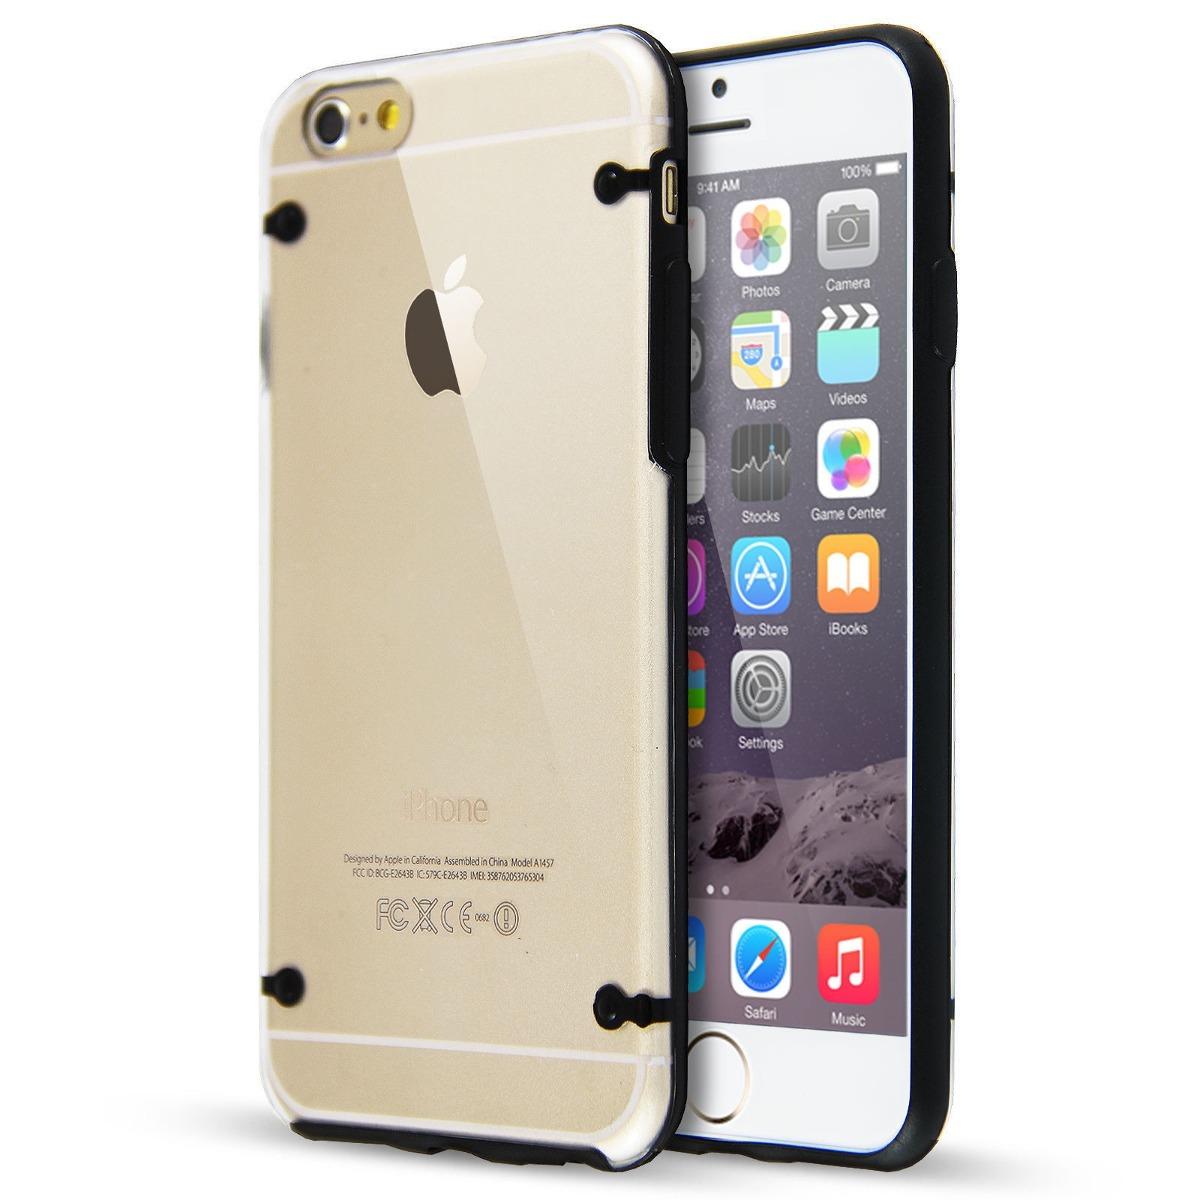 40c9aba7b82 Funda iPhone 6 6 Plus Ultrafina Acrilico Borde Color - $ 99,99 en ...